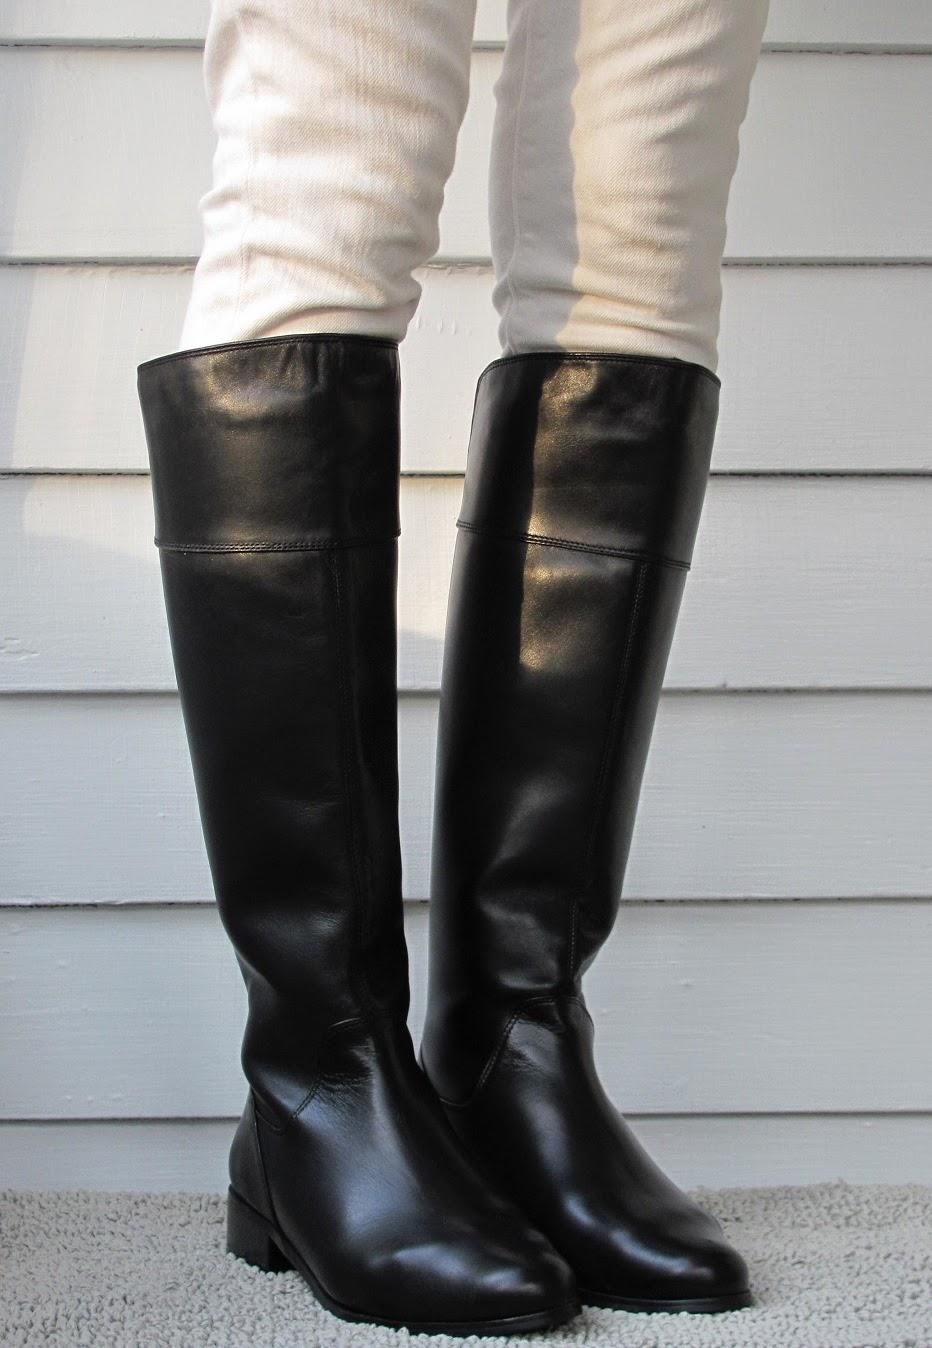 Howdy Slim! Riding Boots for Thin Calves: Vaneli Radon